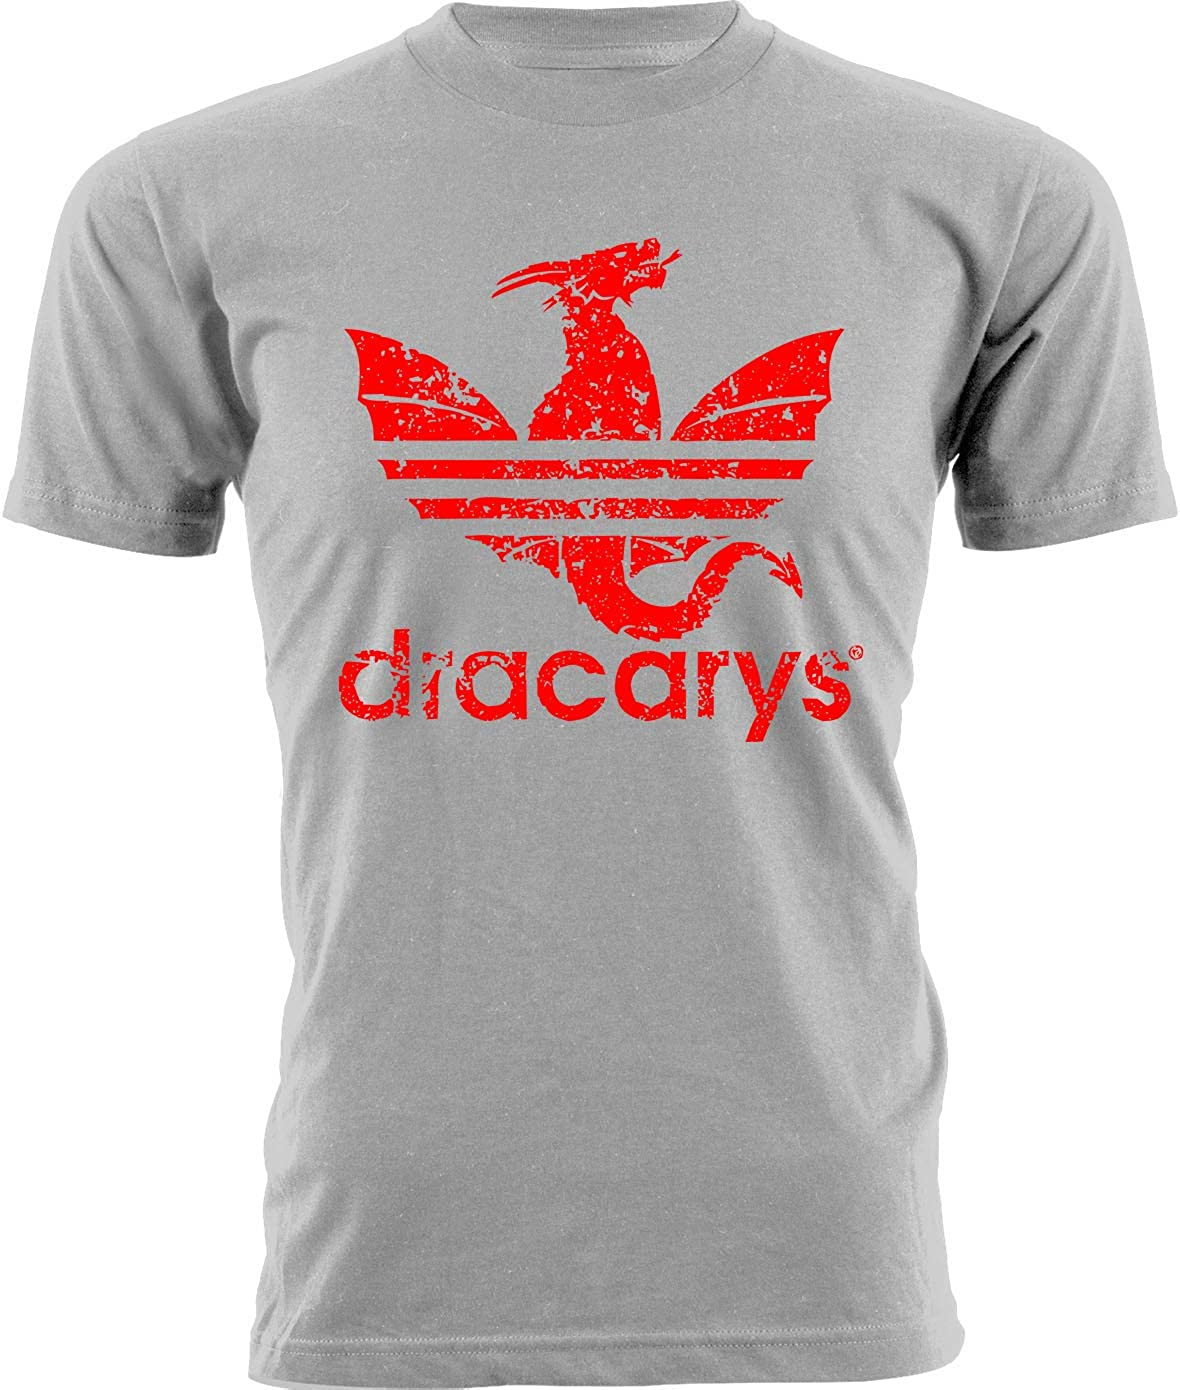 Dracarys Il Trono di Spade Tshirt t-Shirt Maglia Maglietta Game of Thrones